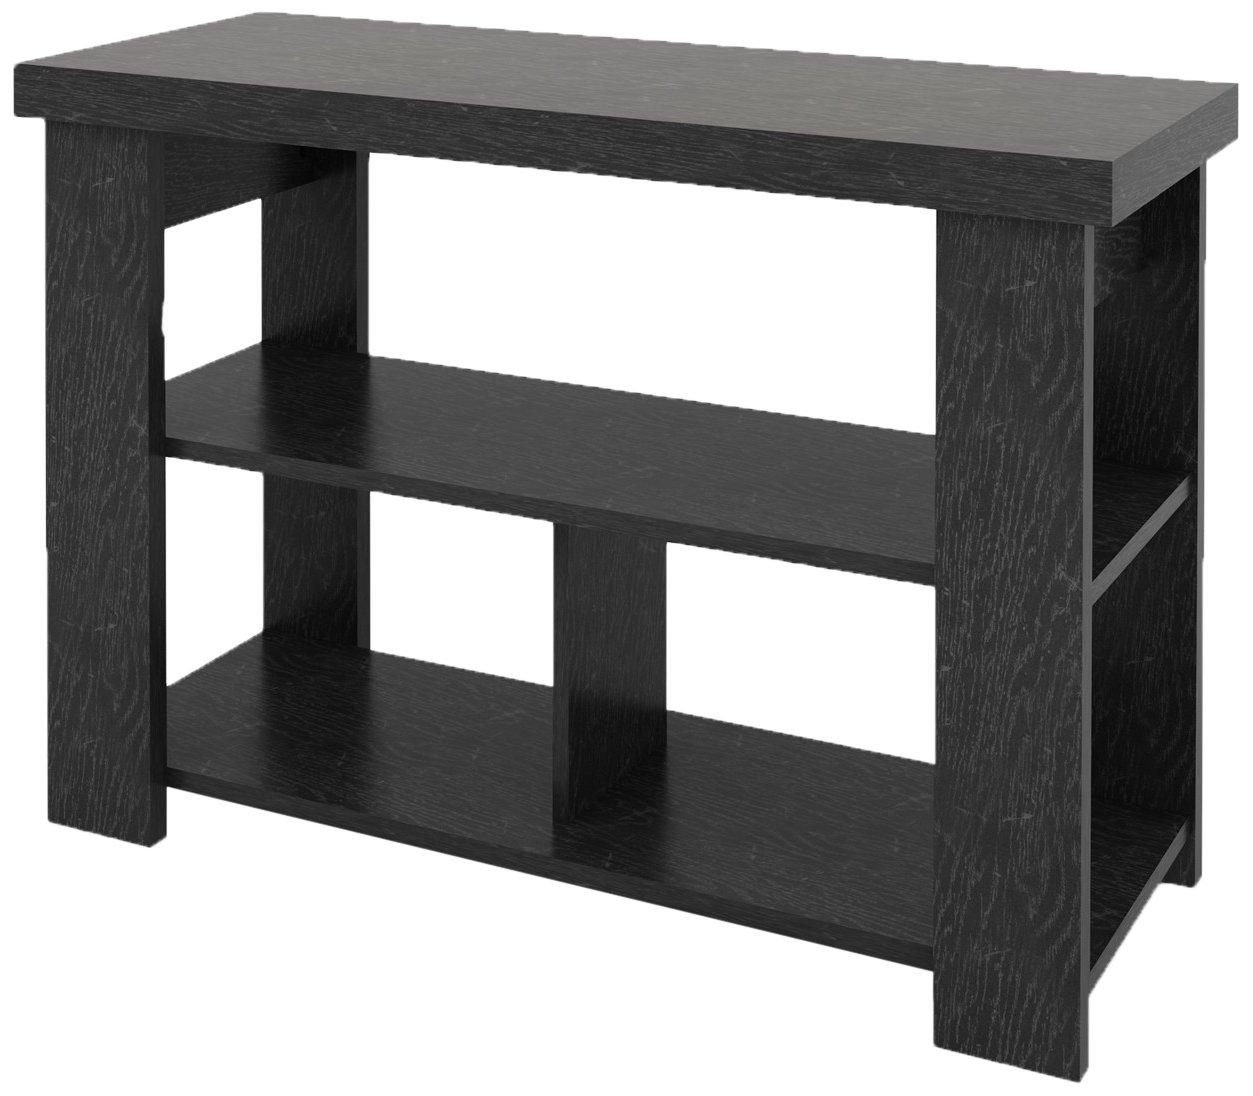 Ameriwood Home Jensen Console Table, Black Ebony Ash